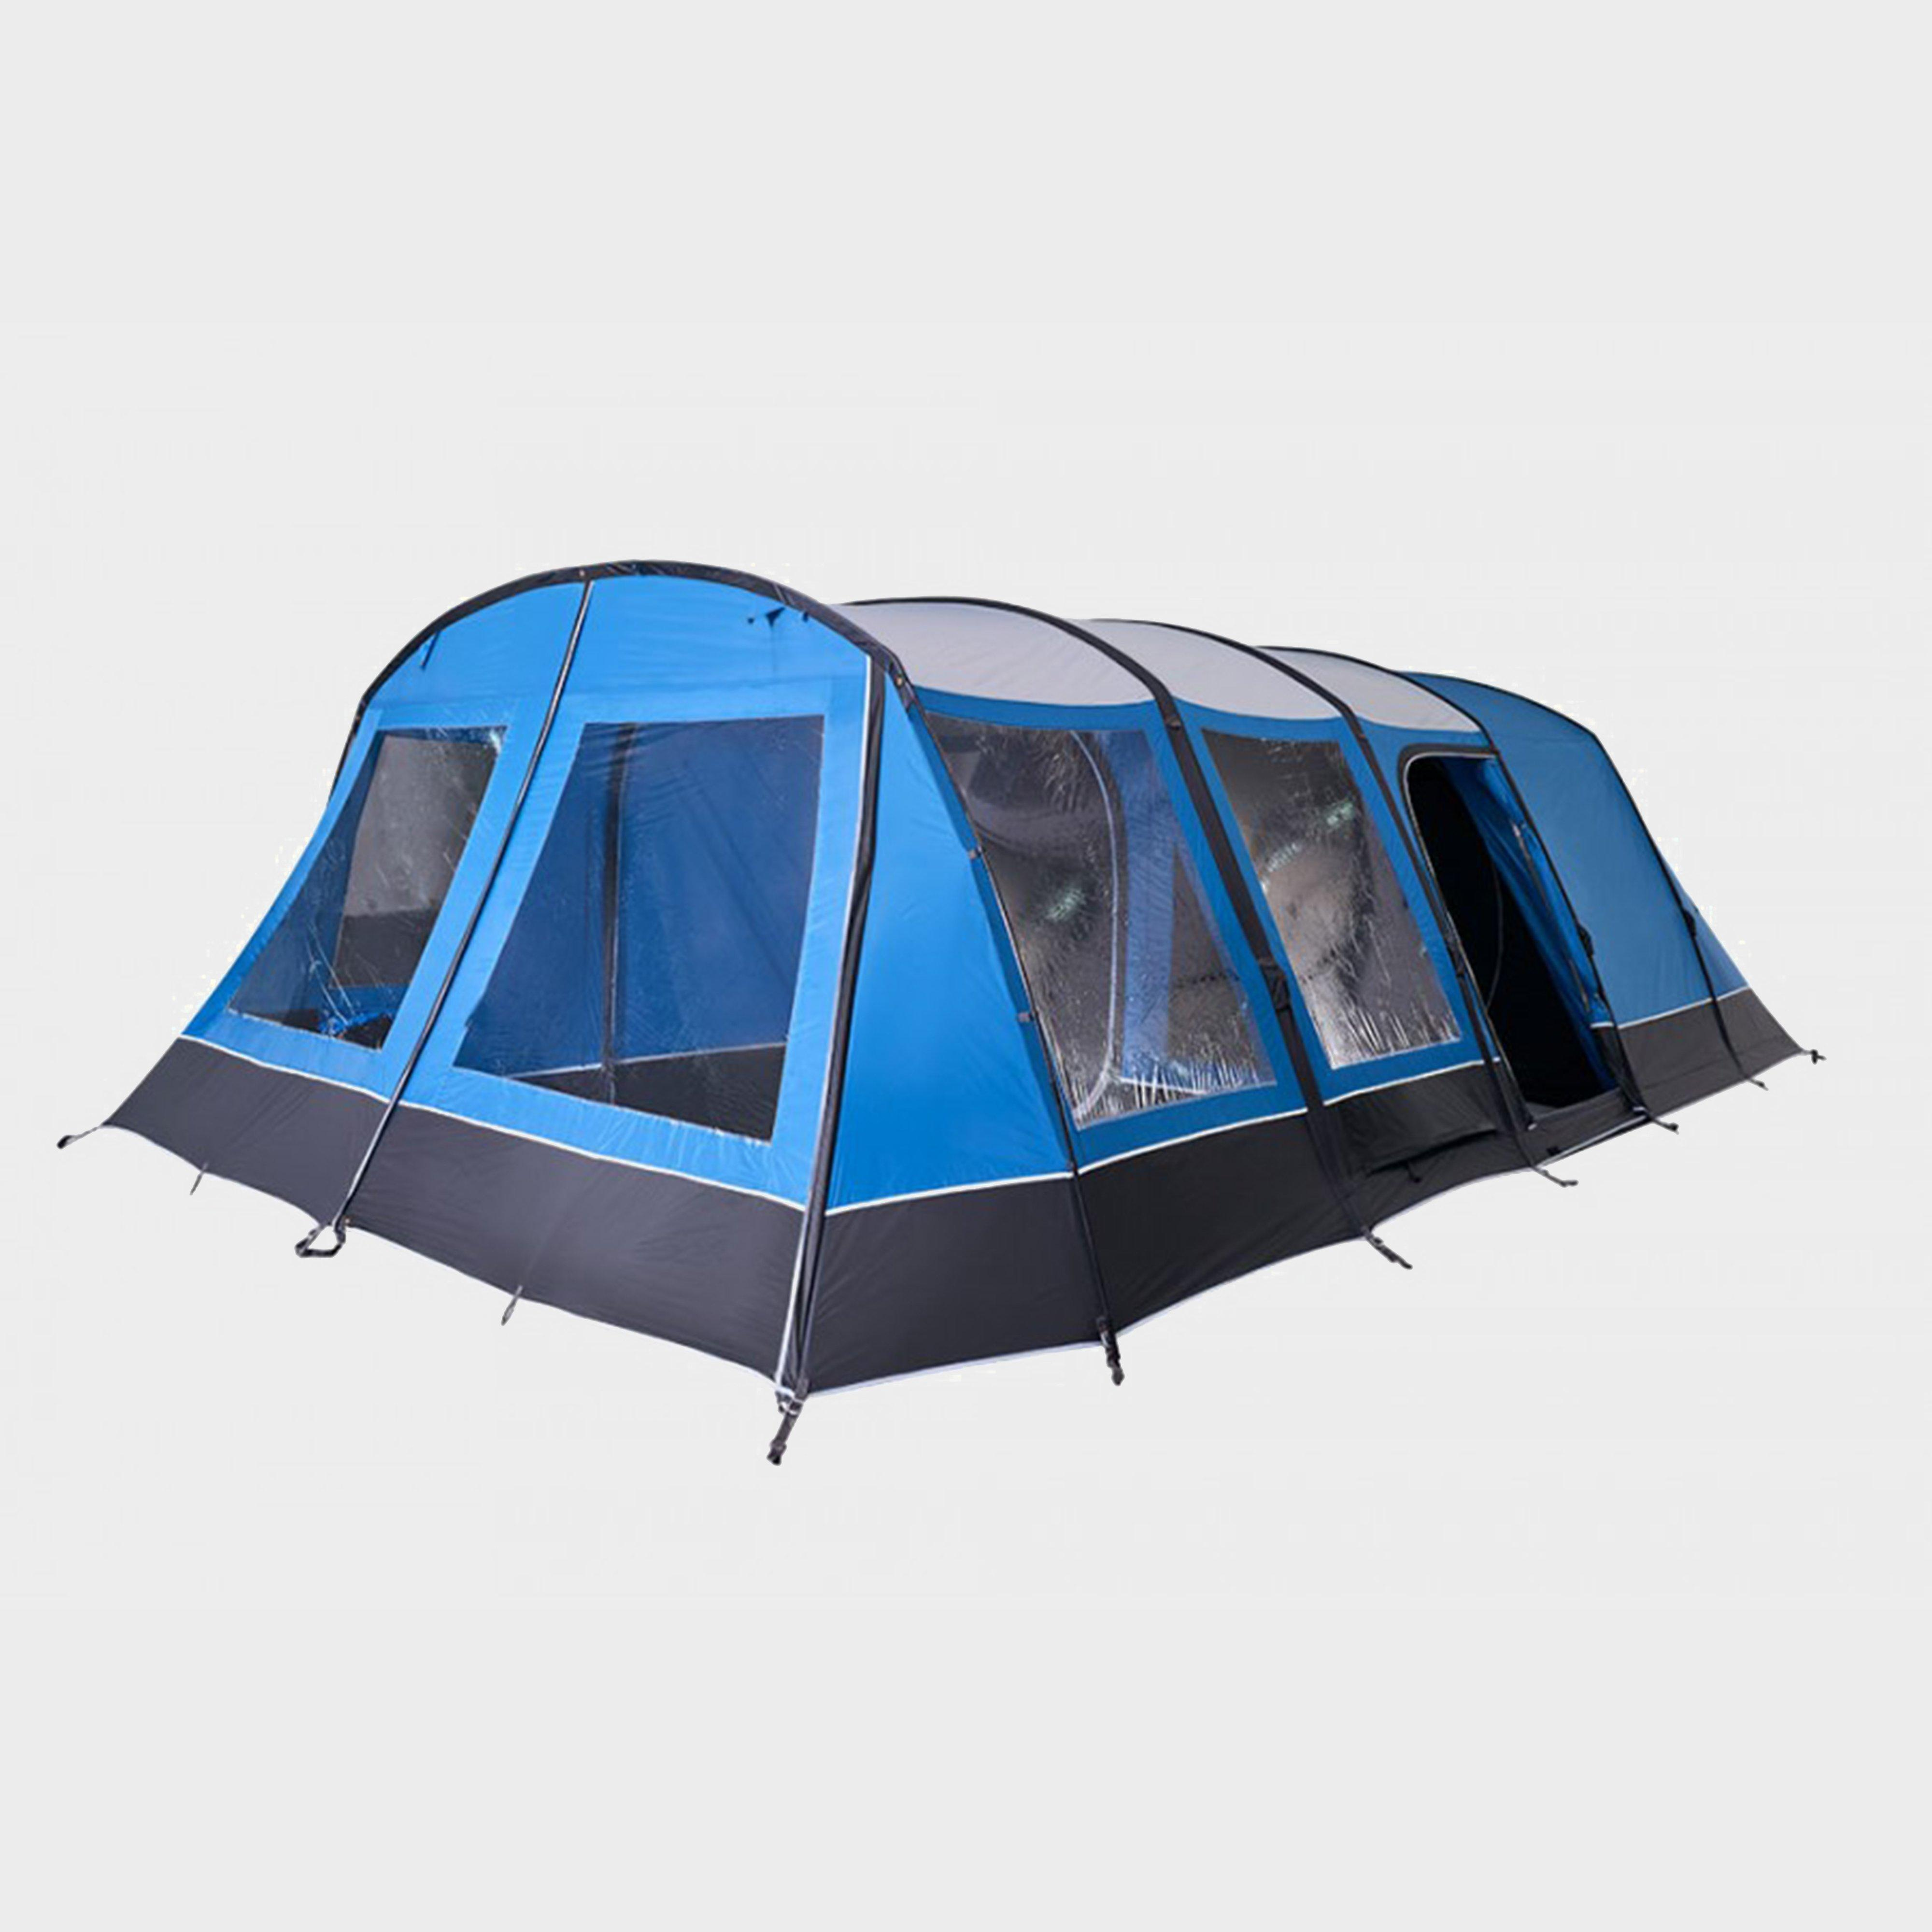 Vango Casa Air Lux Family Tent - Blue/Bbl, Blue/BBL